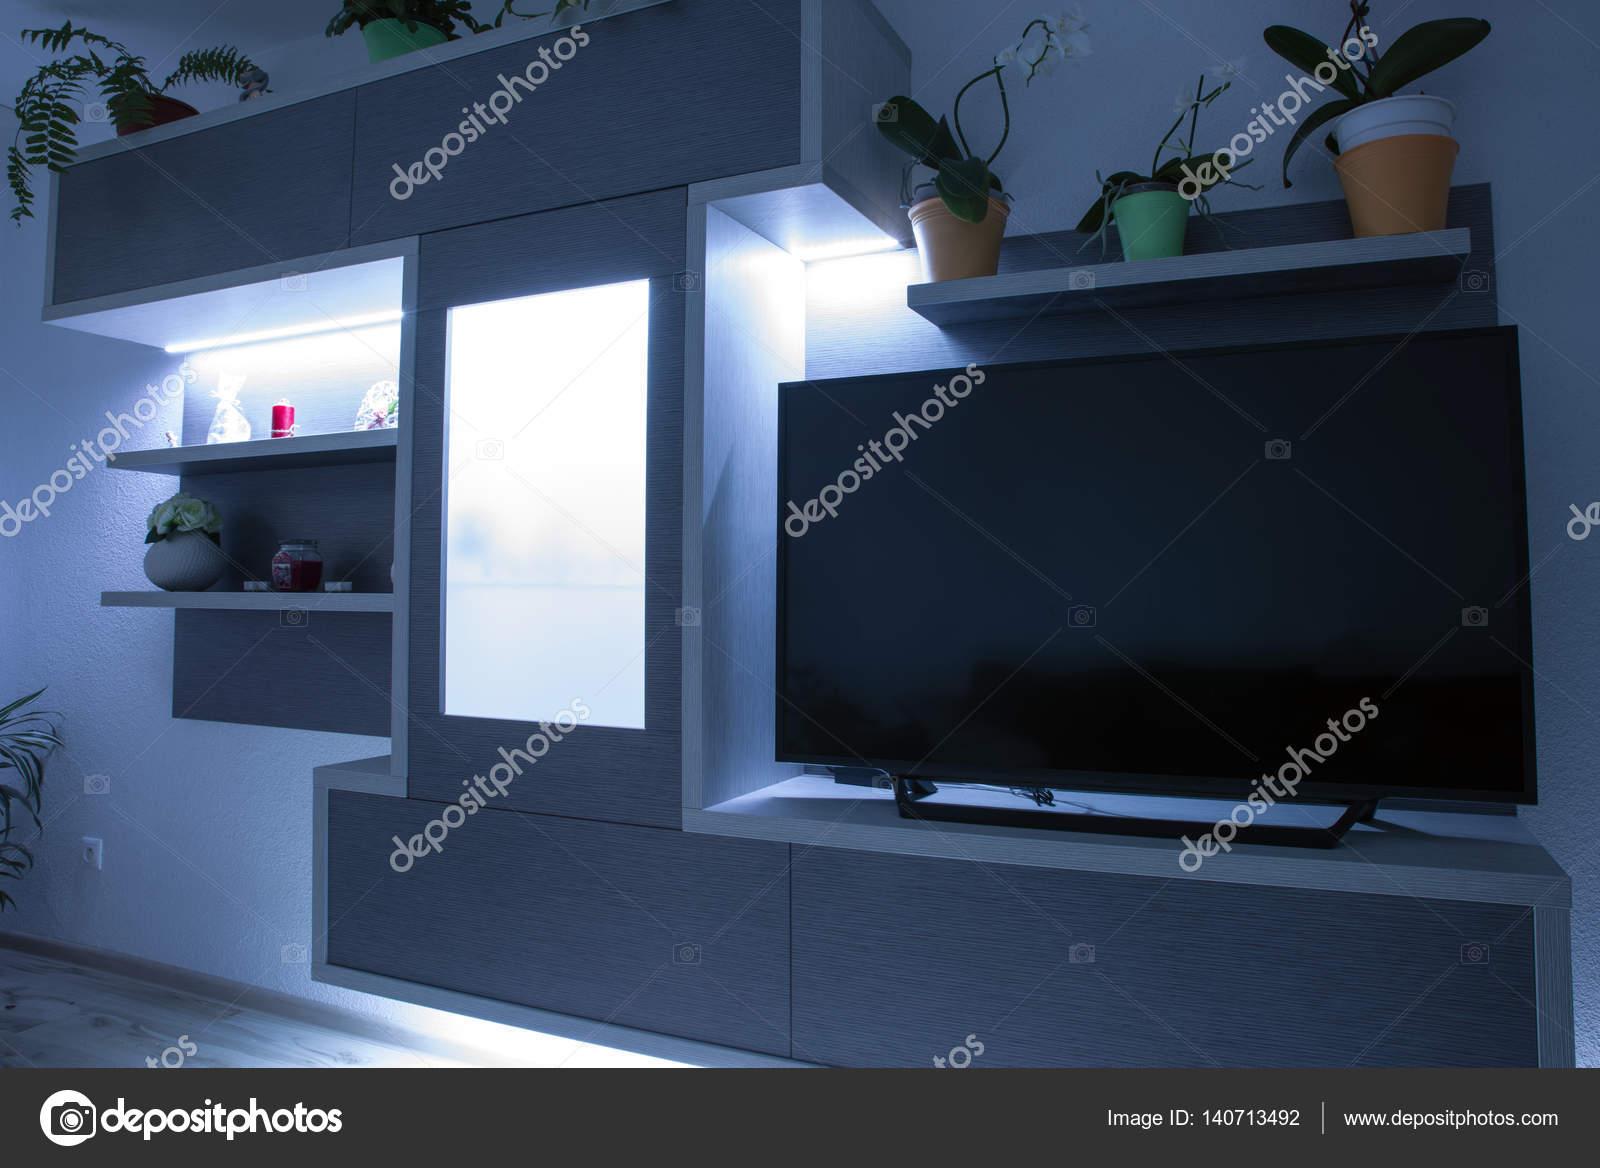 Retroiluminaci N Led En Muebles Foto De Stock Jarino 140713492 # Led Para Muebles